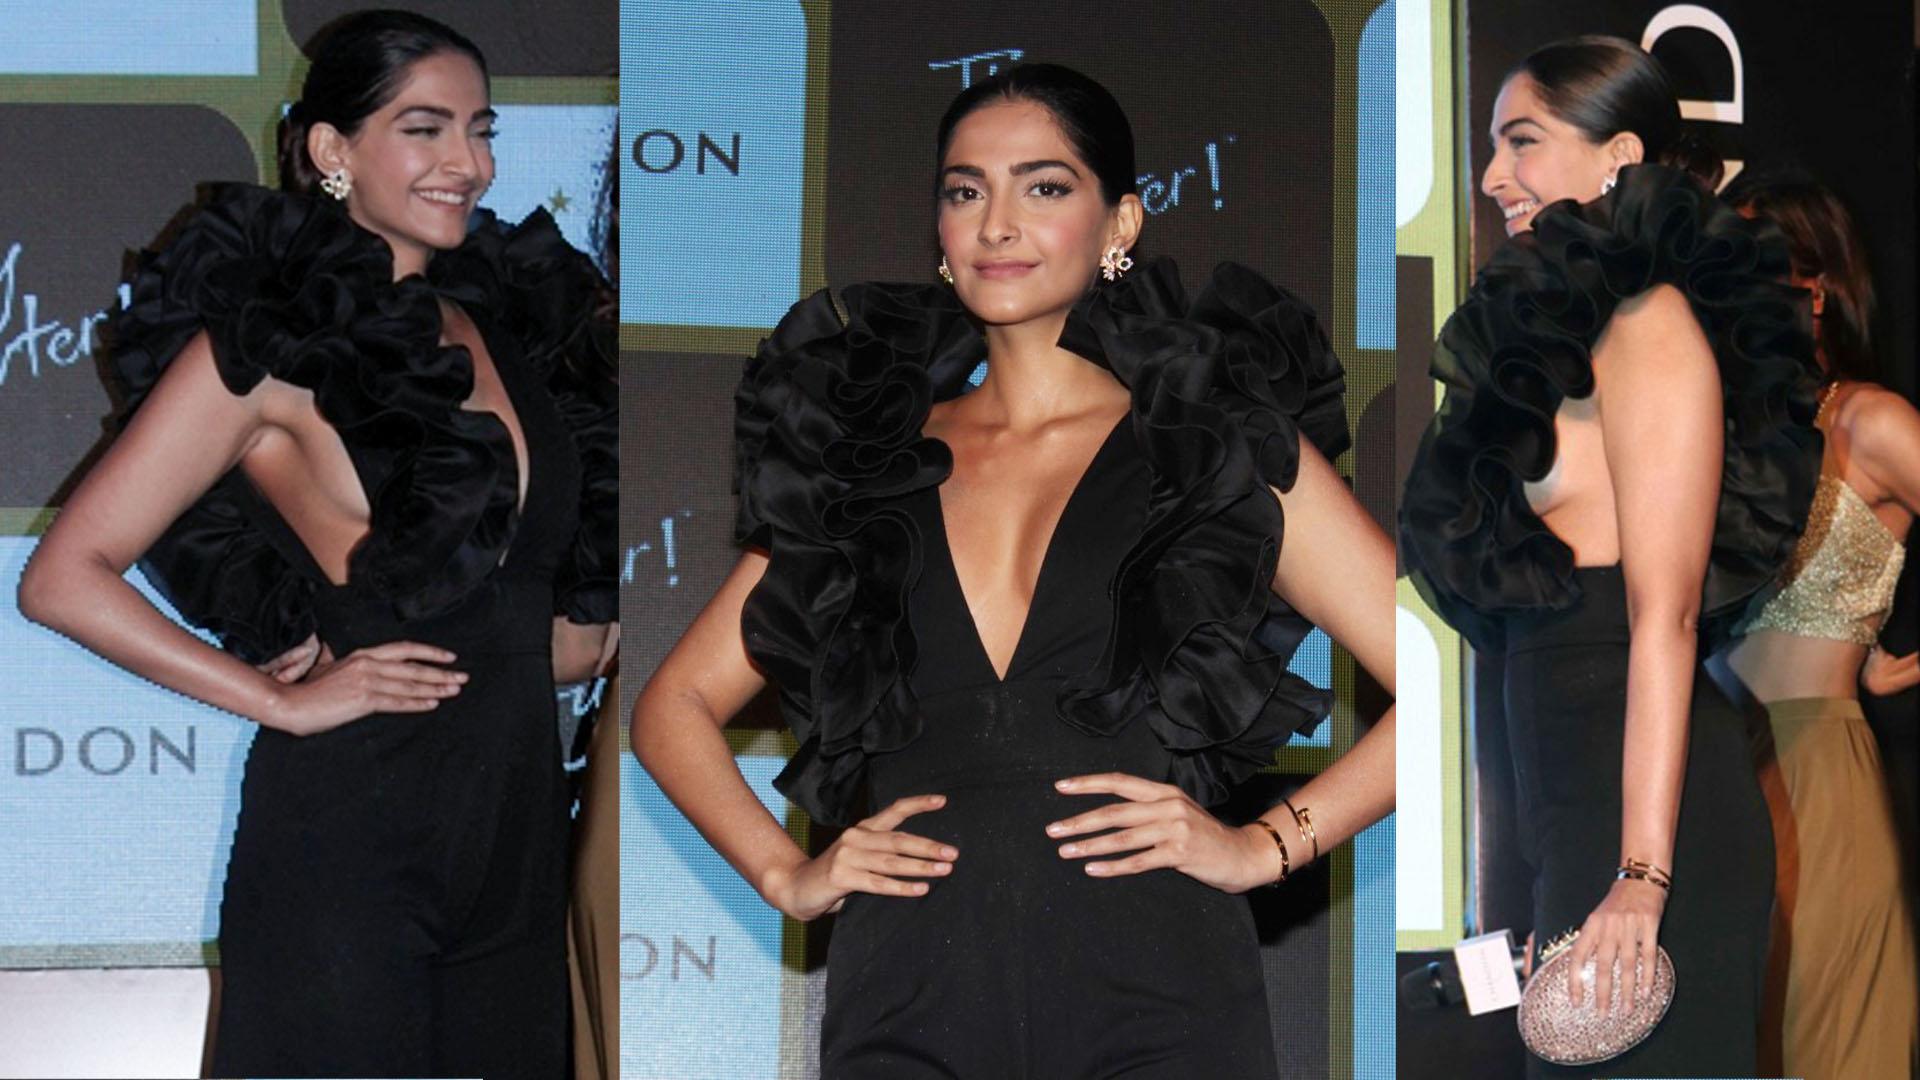 Sonam Kapoor's Bold Dress Grabs Eyeballs